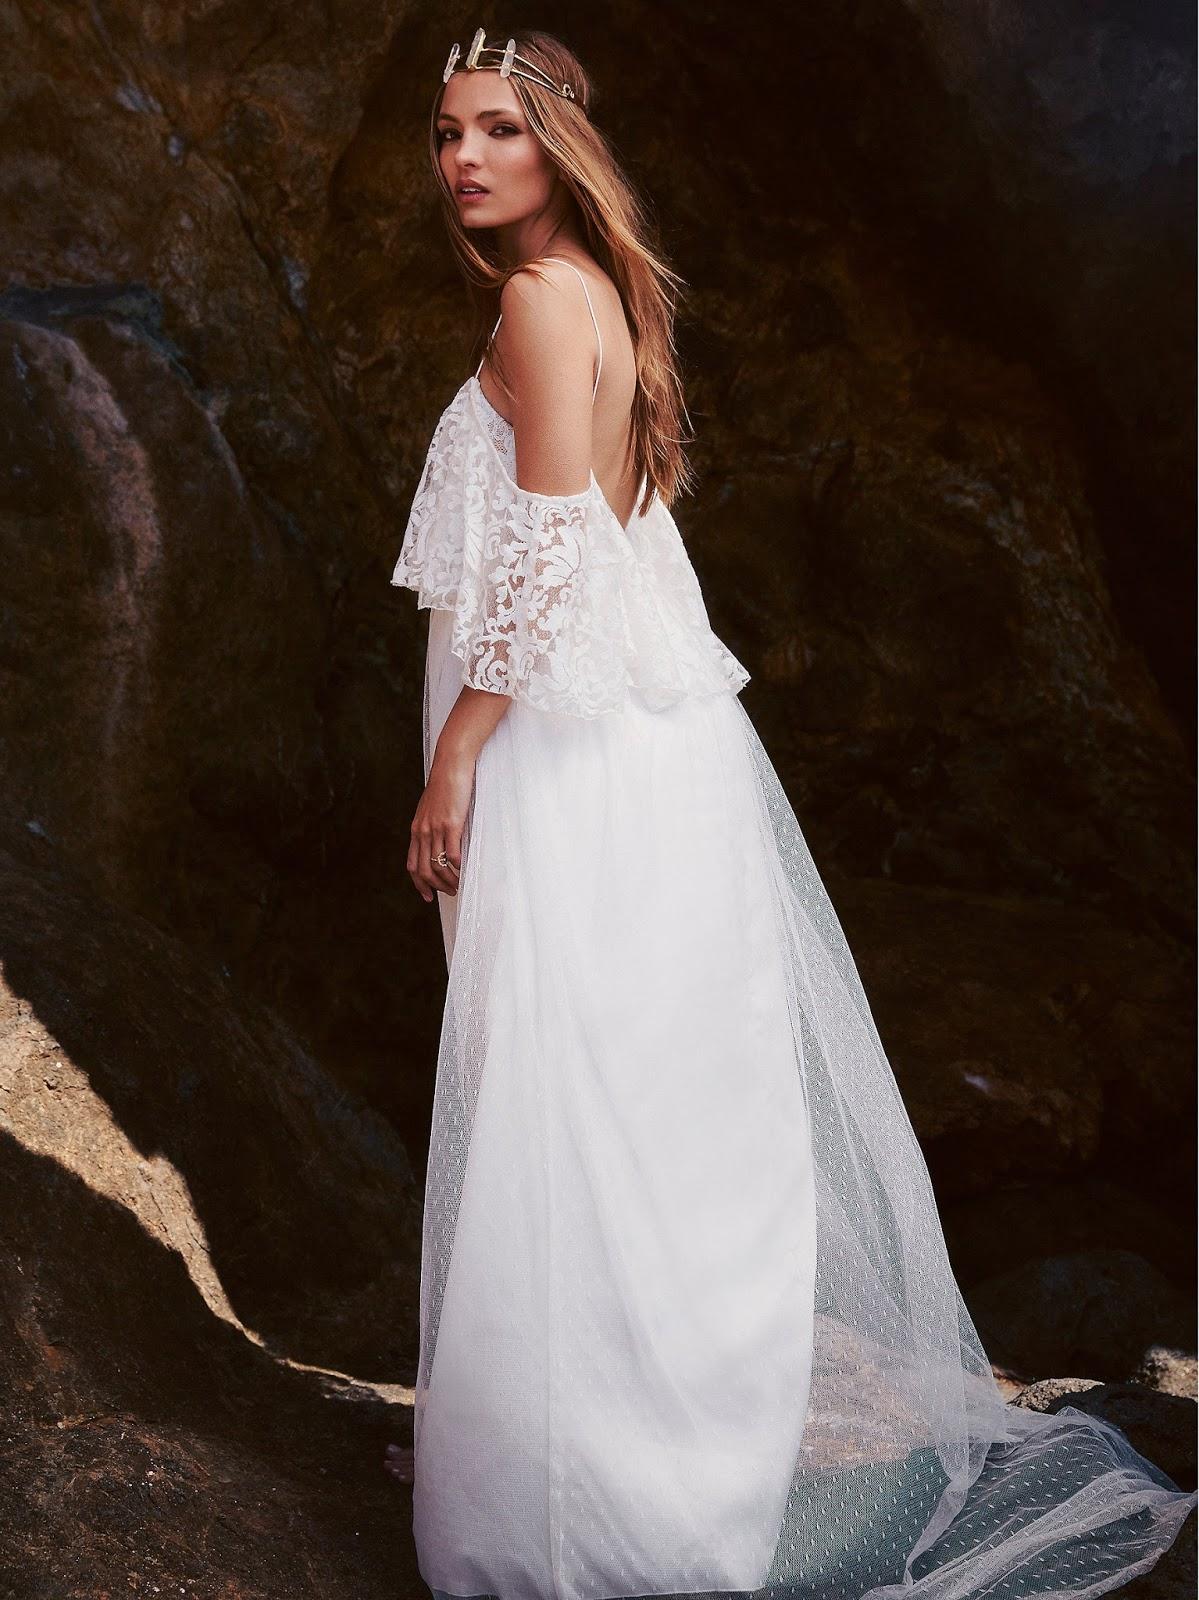 rent designer wedding dress wedding dress rental inbal dror israeli designers inbal dror wedding dress rental israel wedding gowns